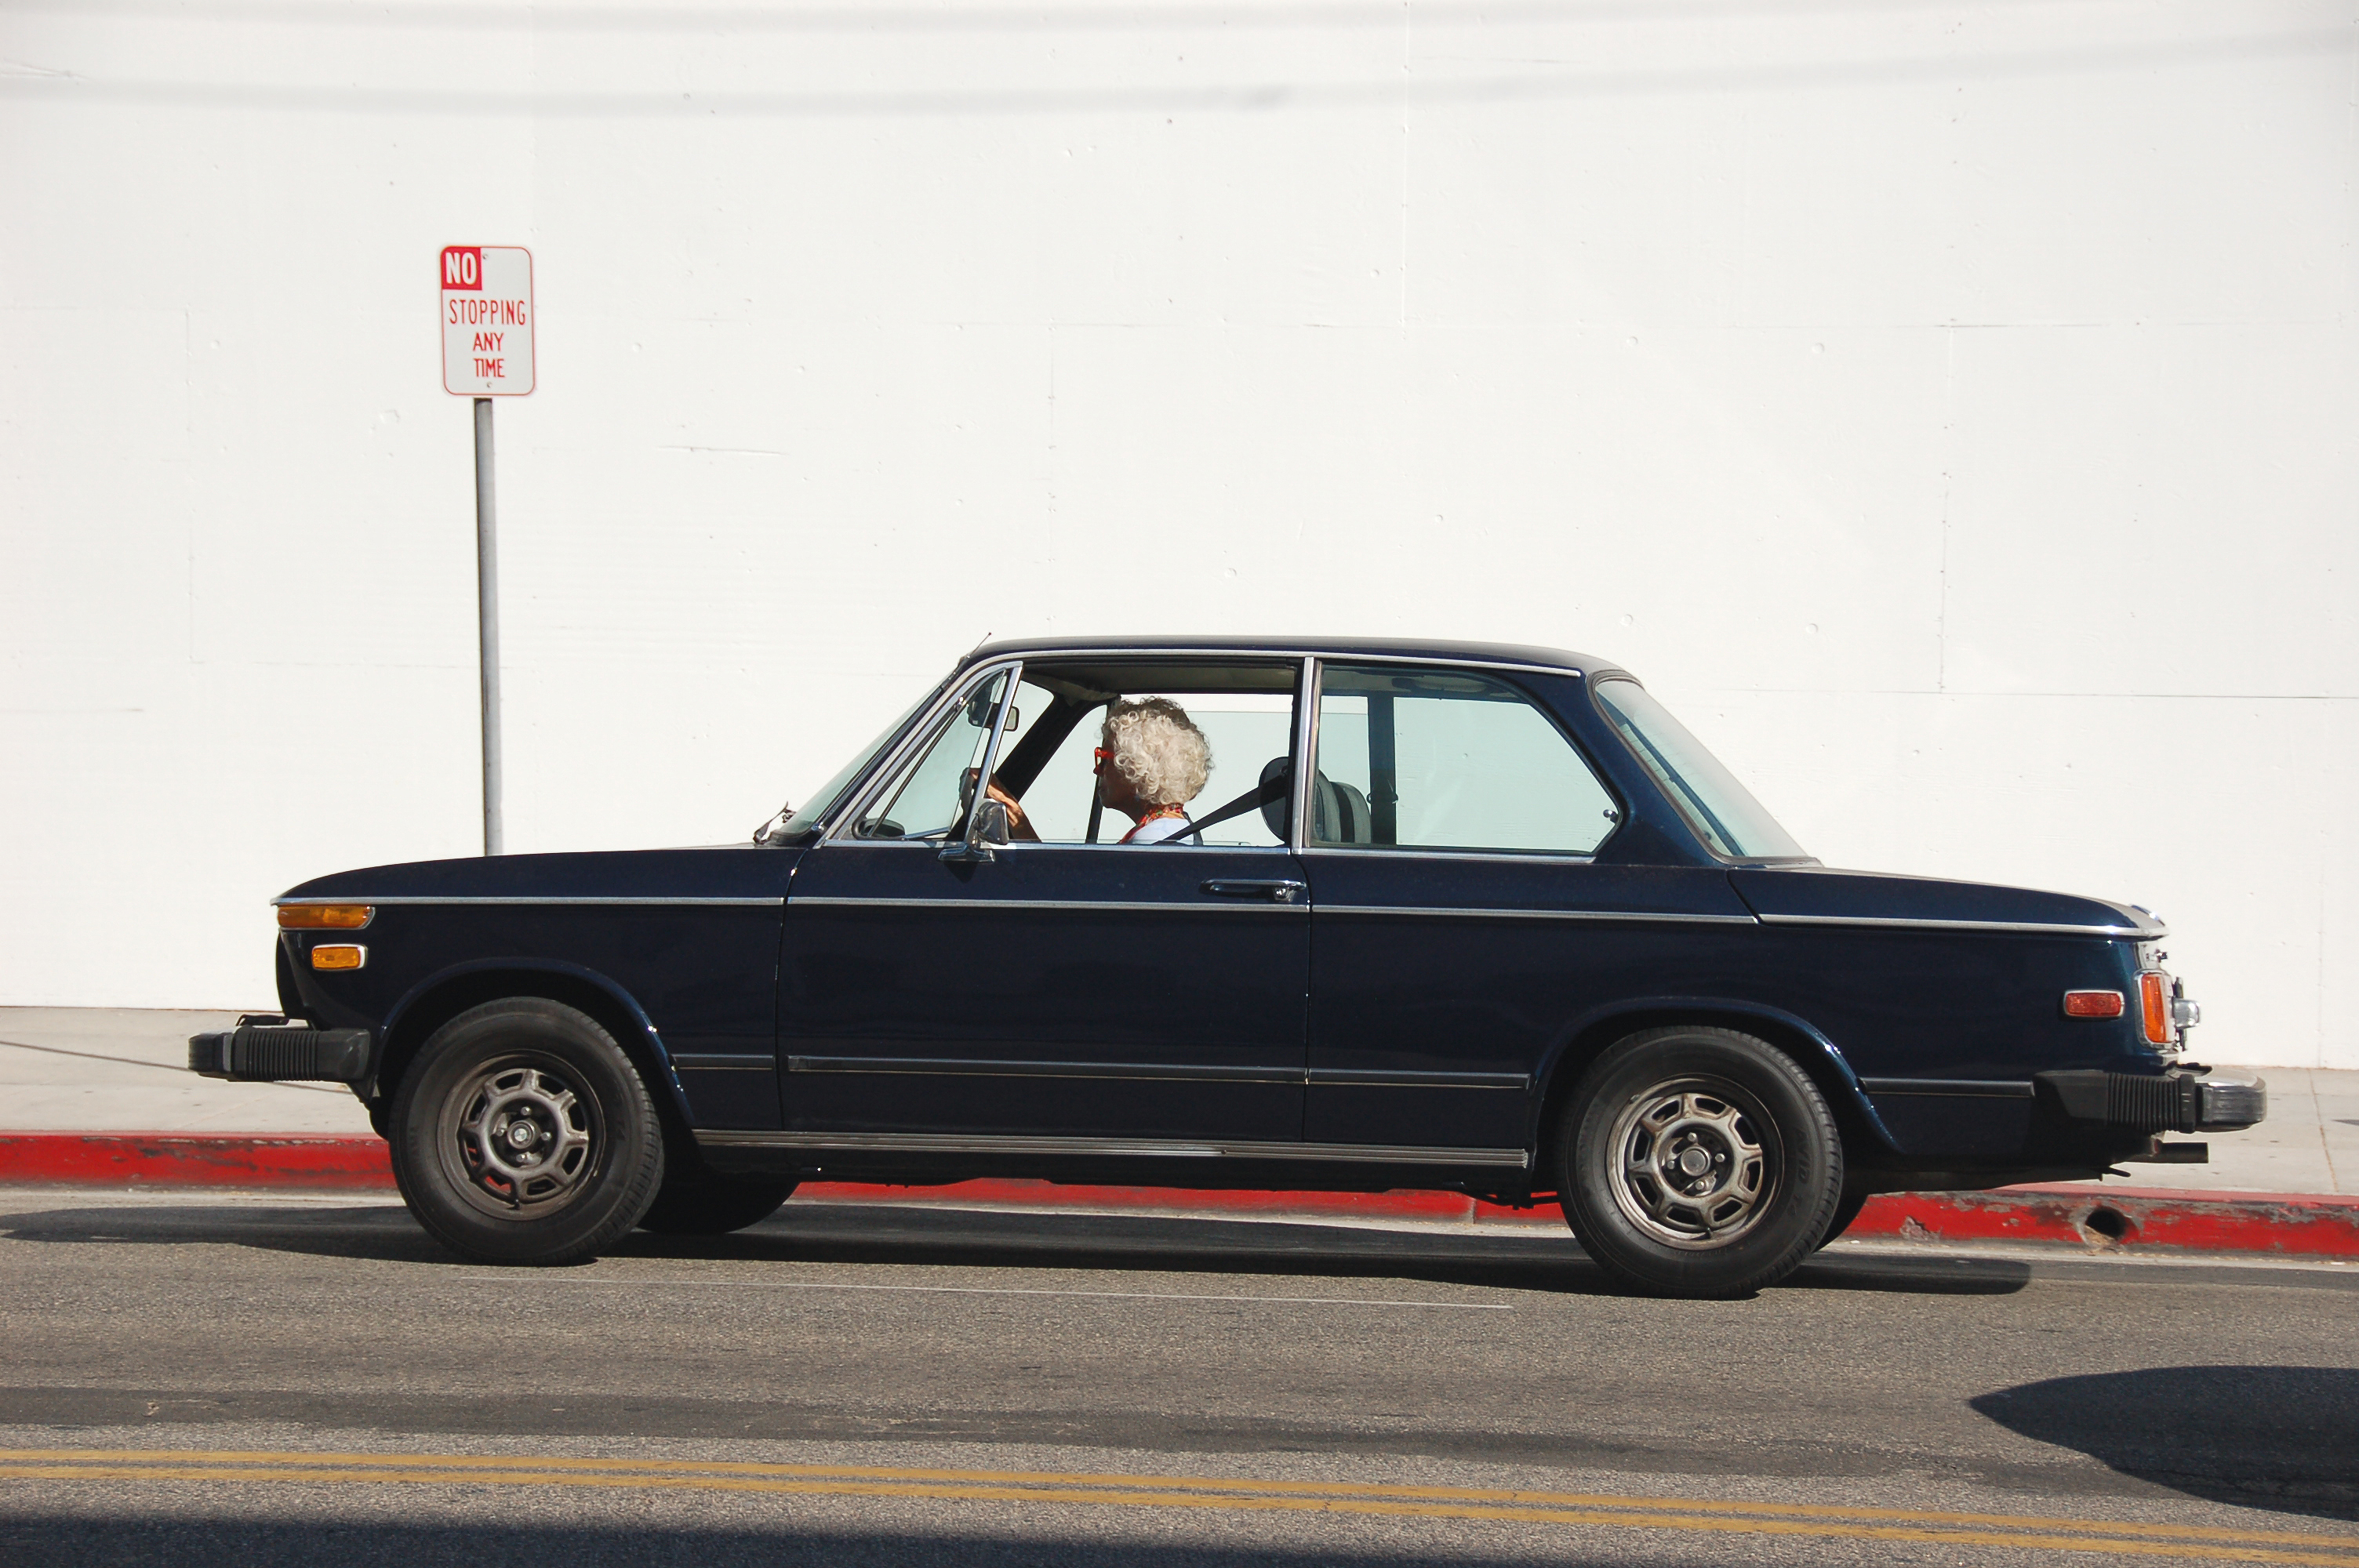 File:Old woman driving blue car (Unsplash).jpg - Wikimedia Commons